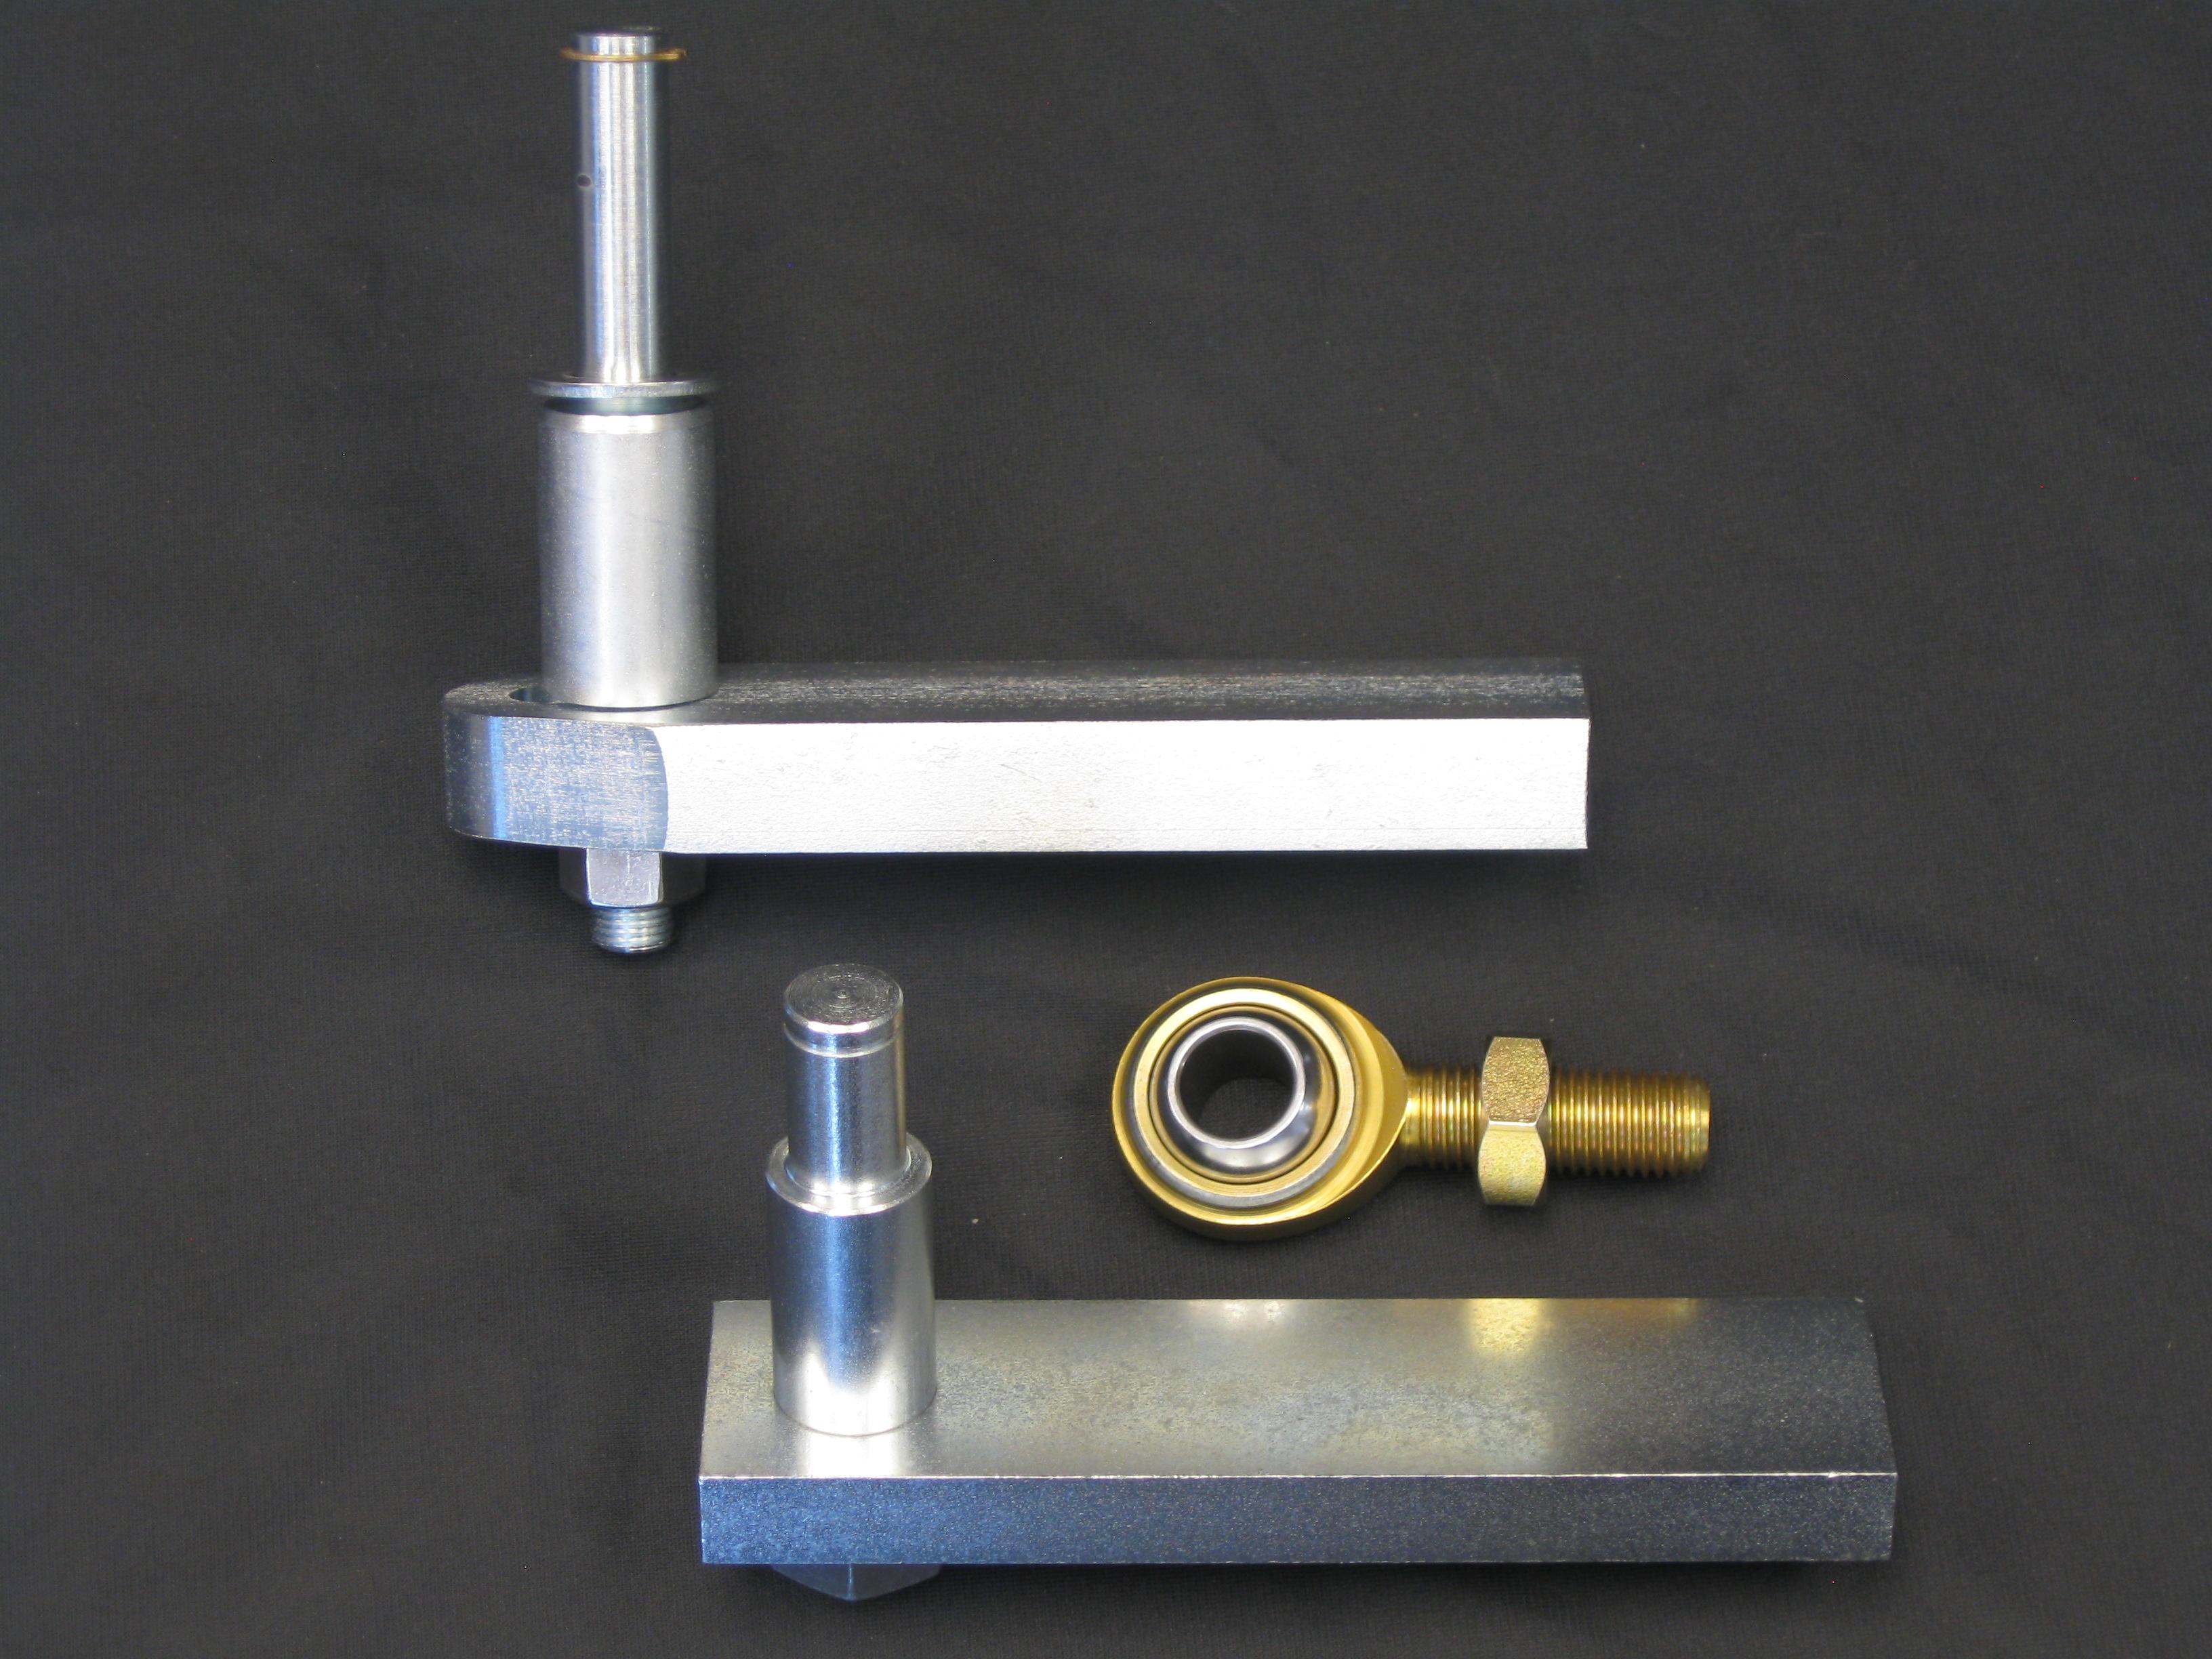 pin locks gate opener - Byan Sytems Inc